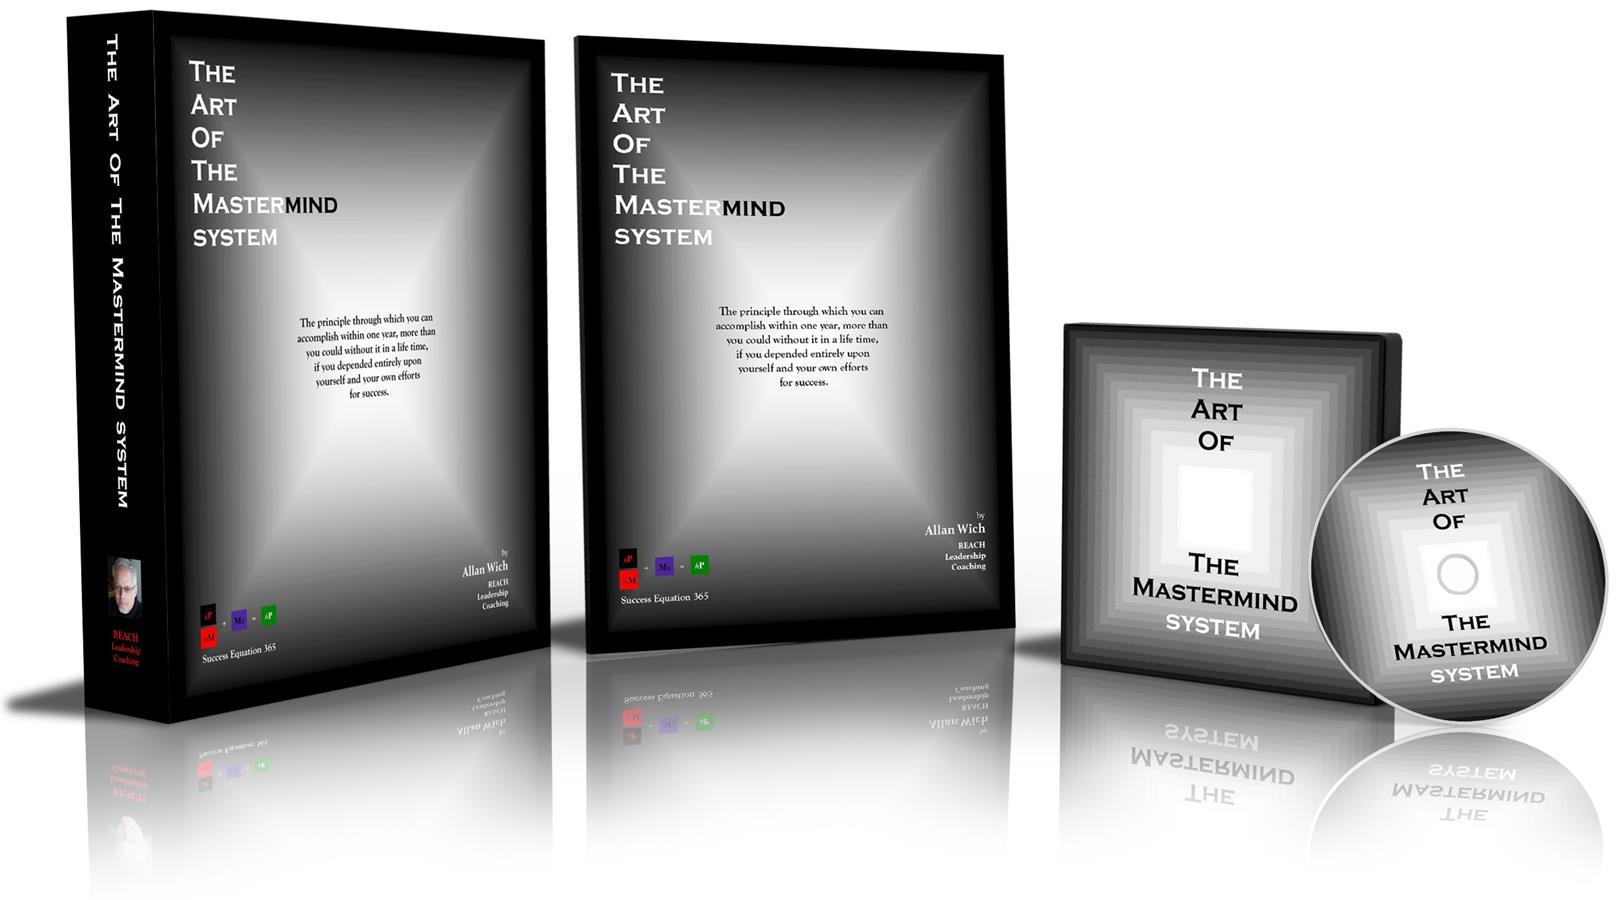 art-of-the-mastermind-work-web